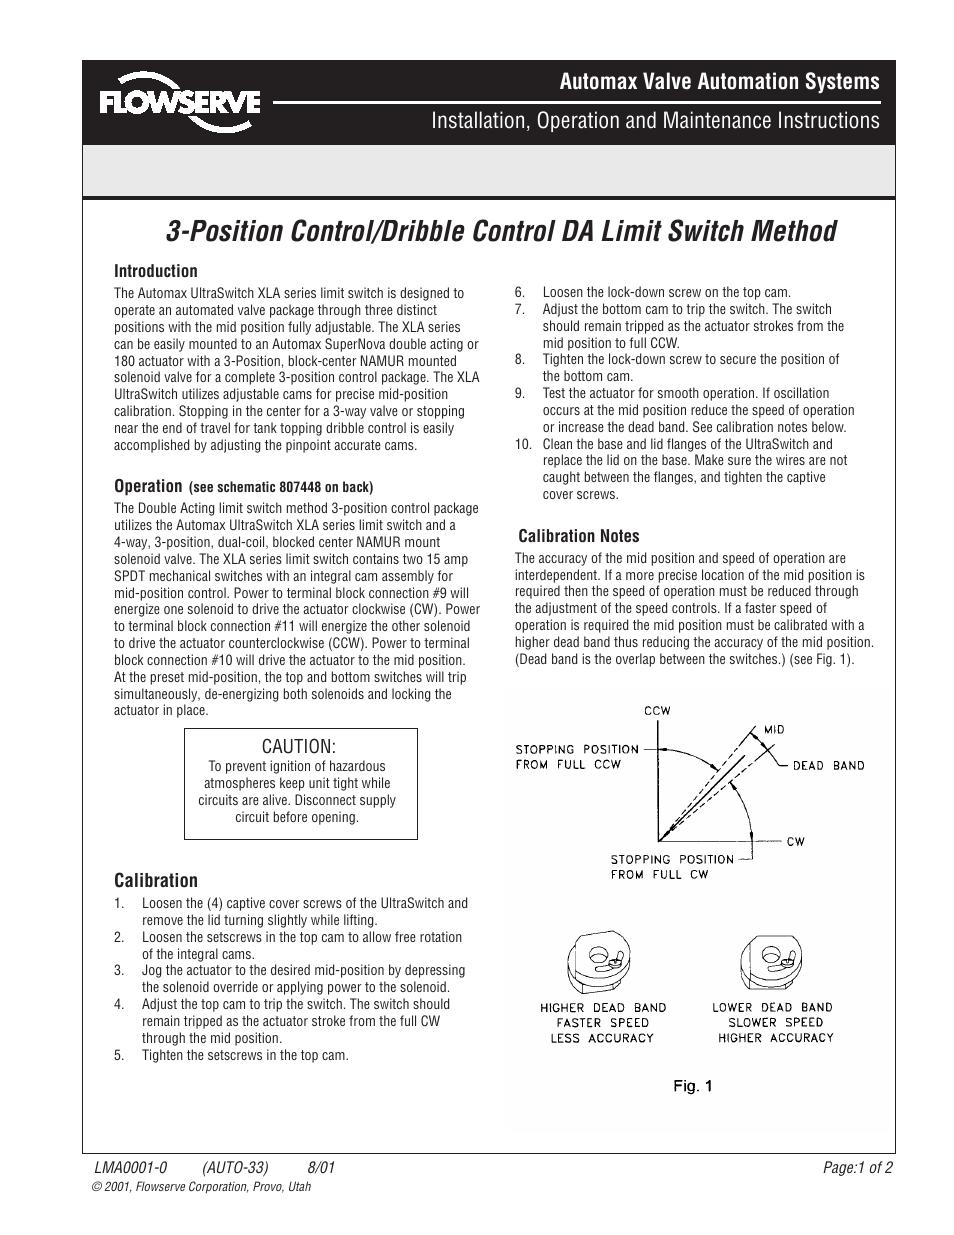 Flowserve DA Limit Switch Method 3-Position Control User